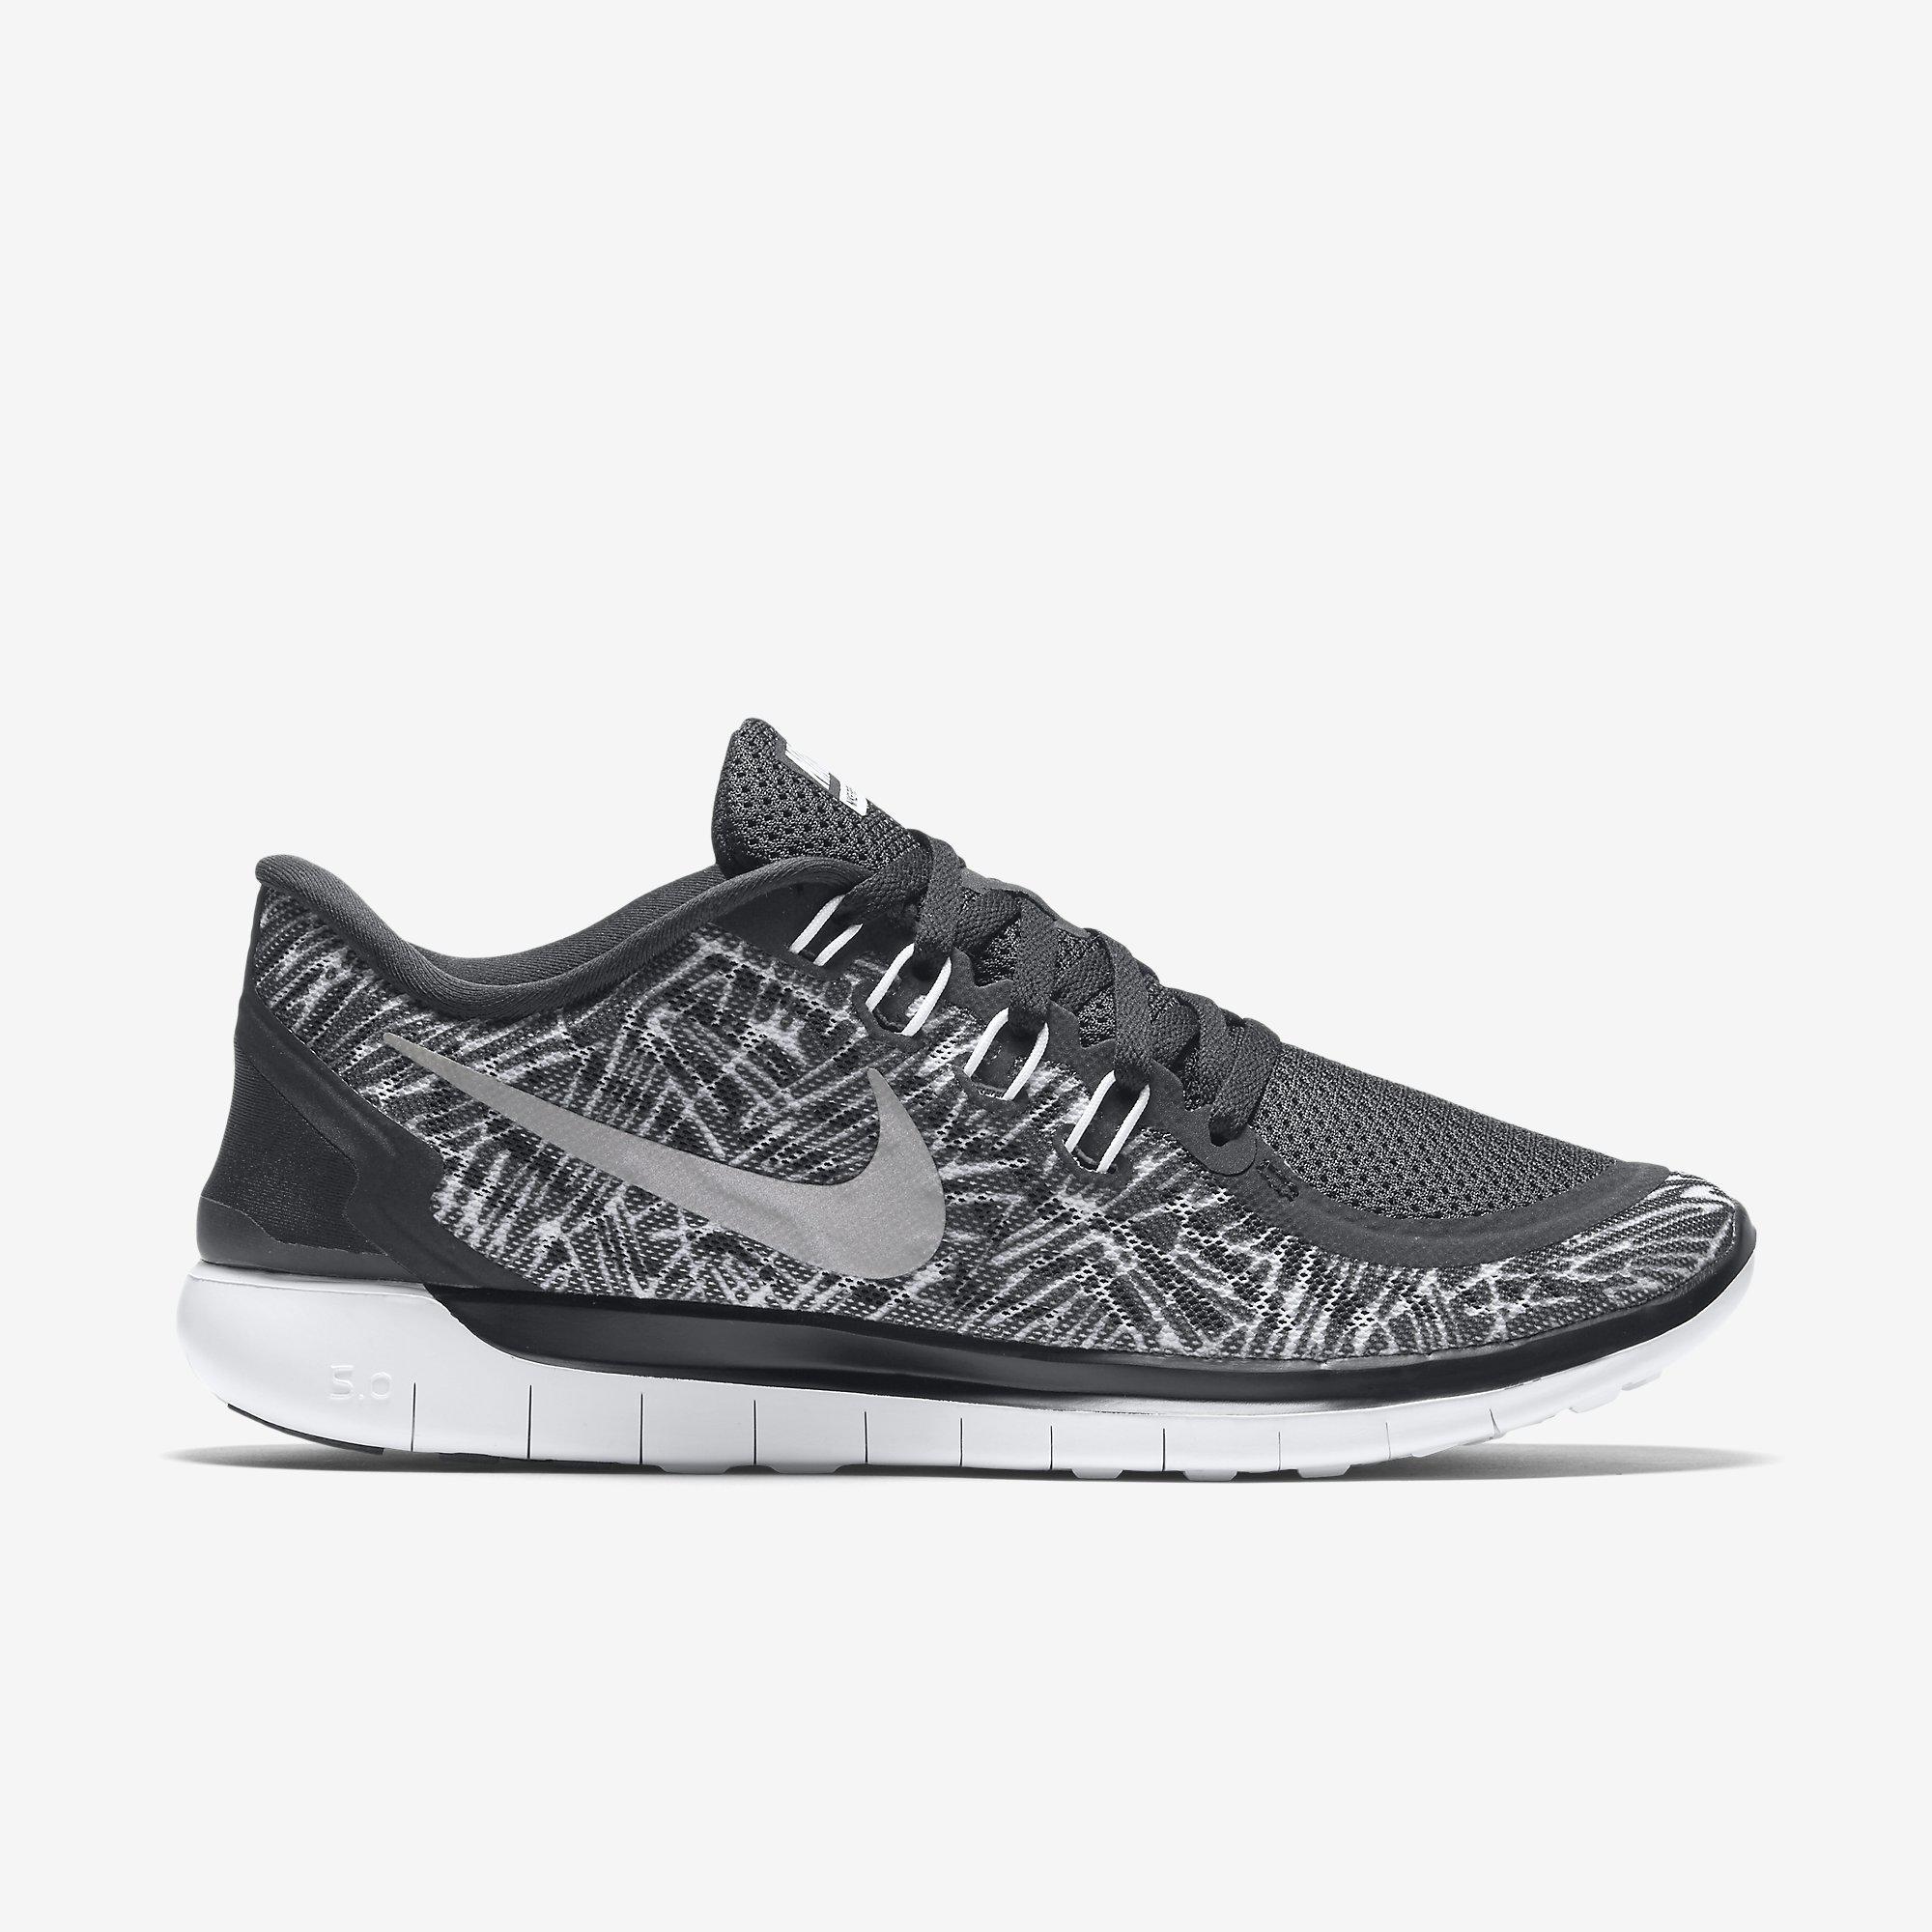 Nike Womens Free 5.0 Print Running Shoes - Black White - Tennisnuts.com fde8e82f7